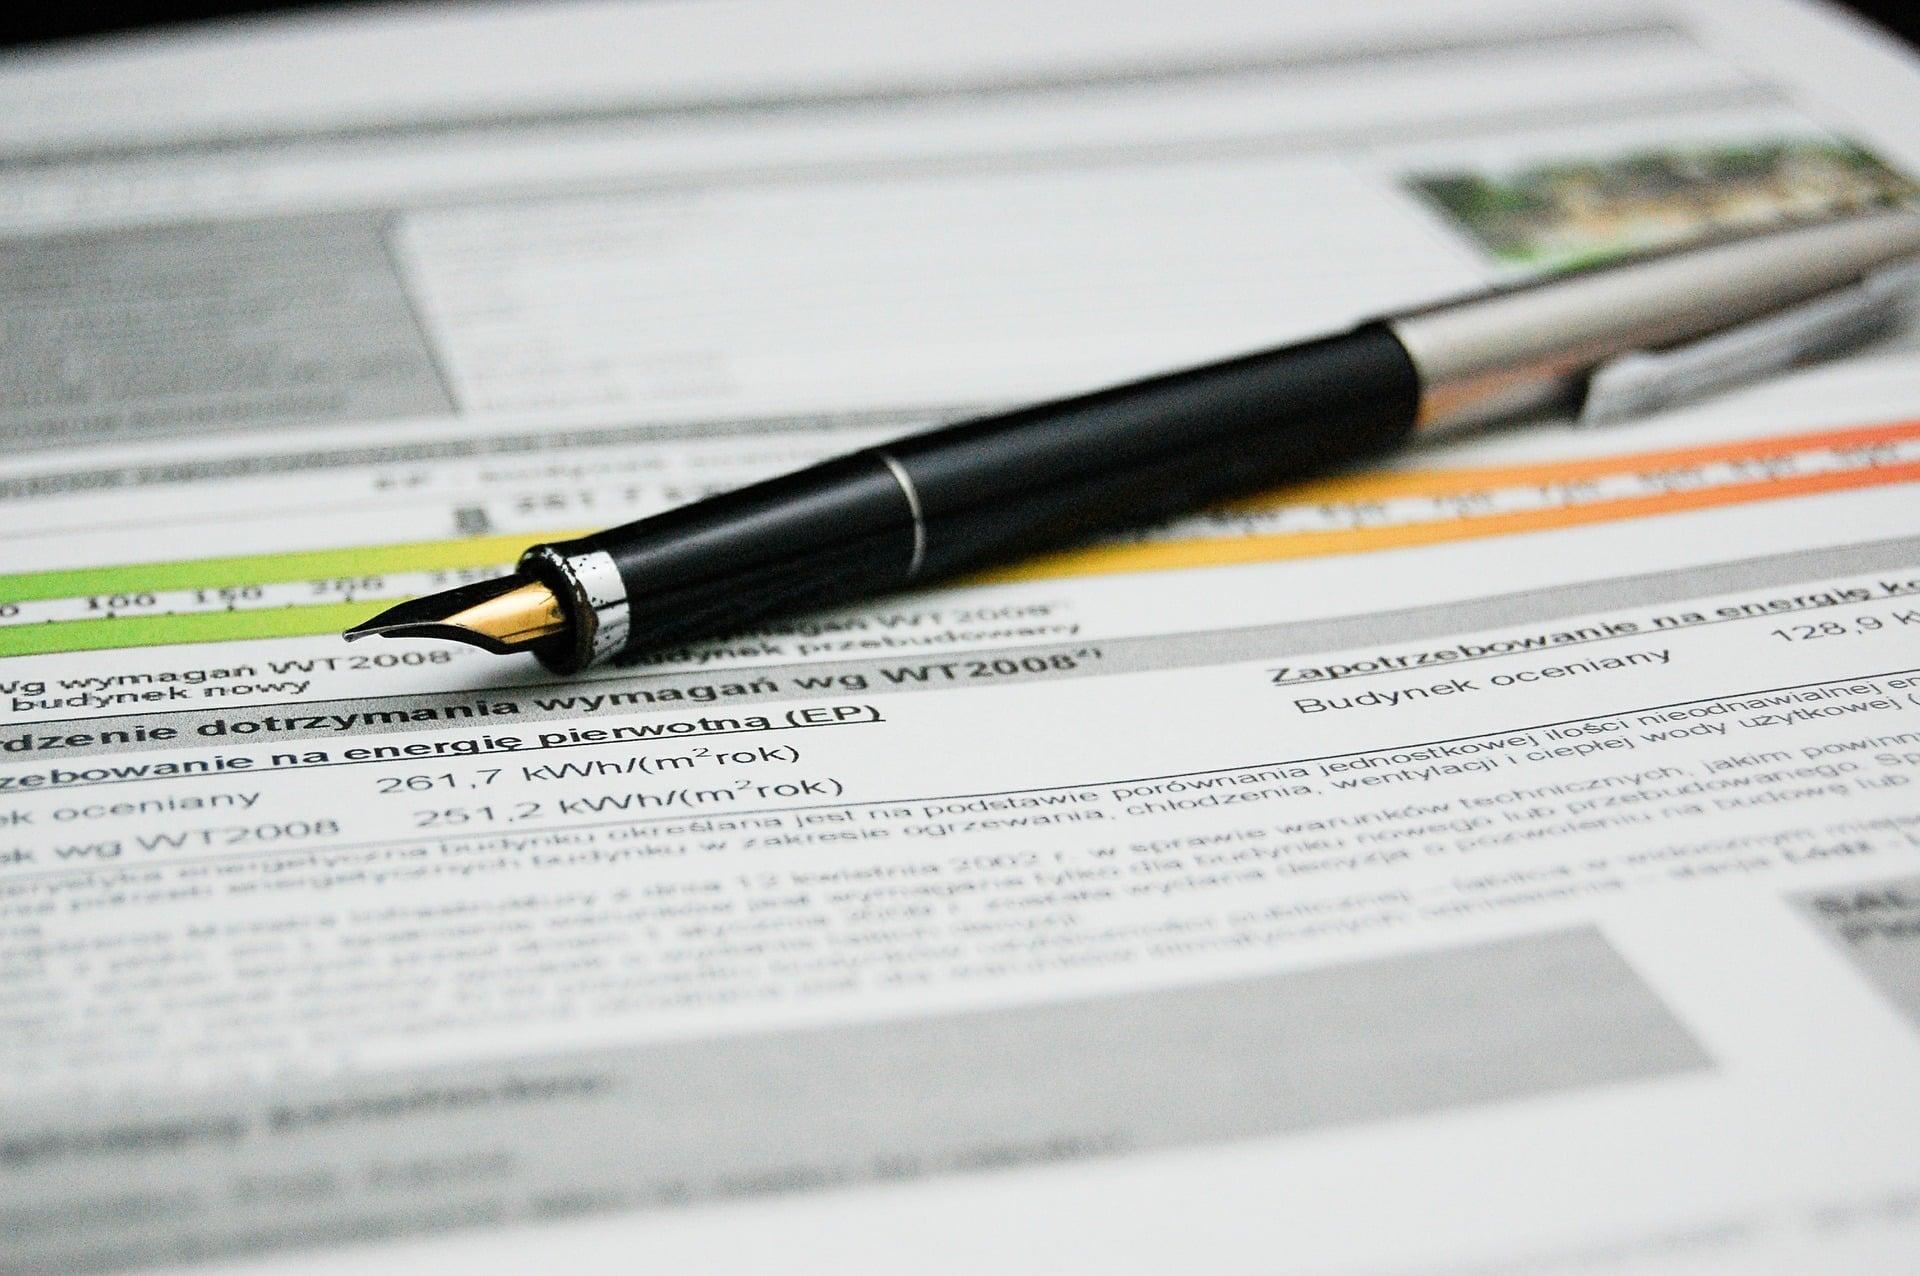 Der Energieausweis zeigt den Grad der Energieeffizienz bei Immobilien. Foto: Pixabay.